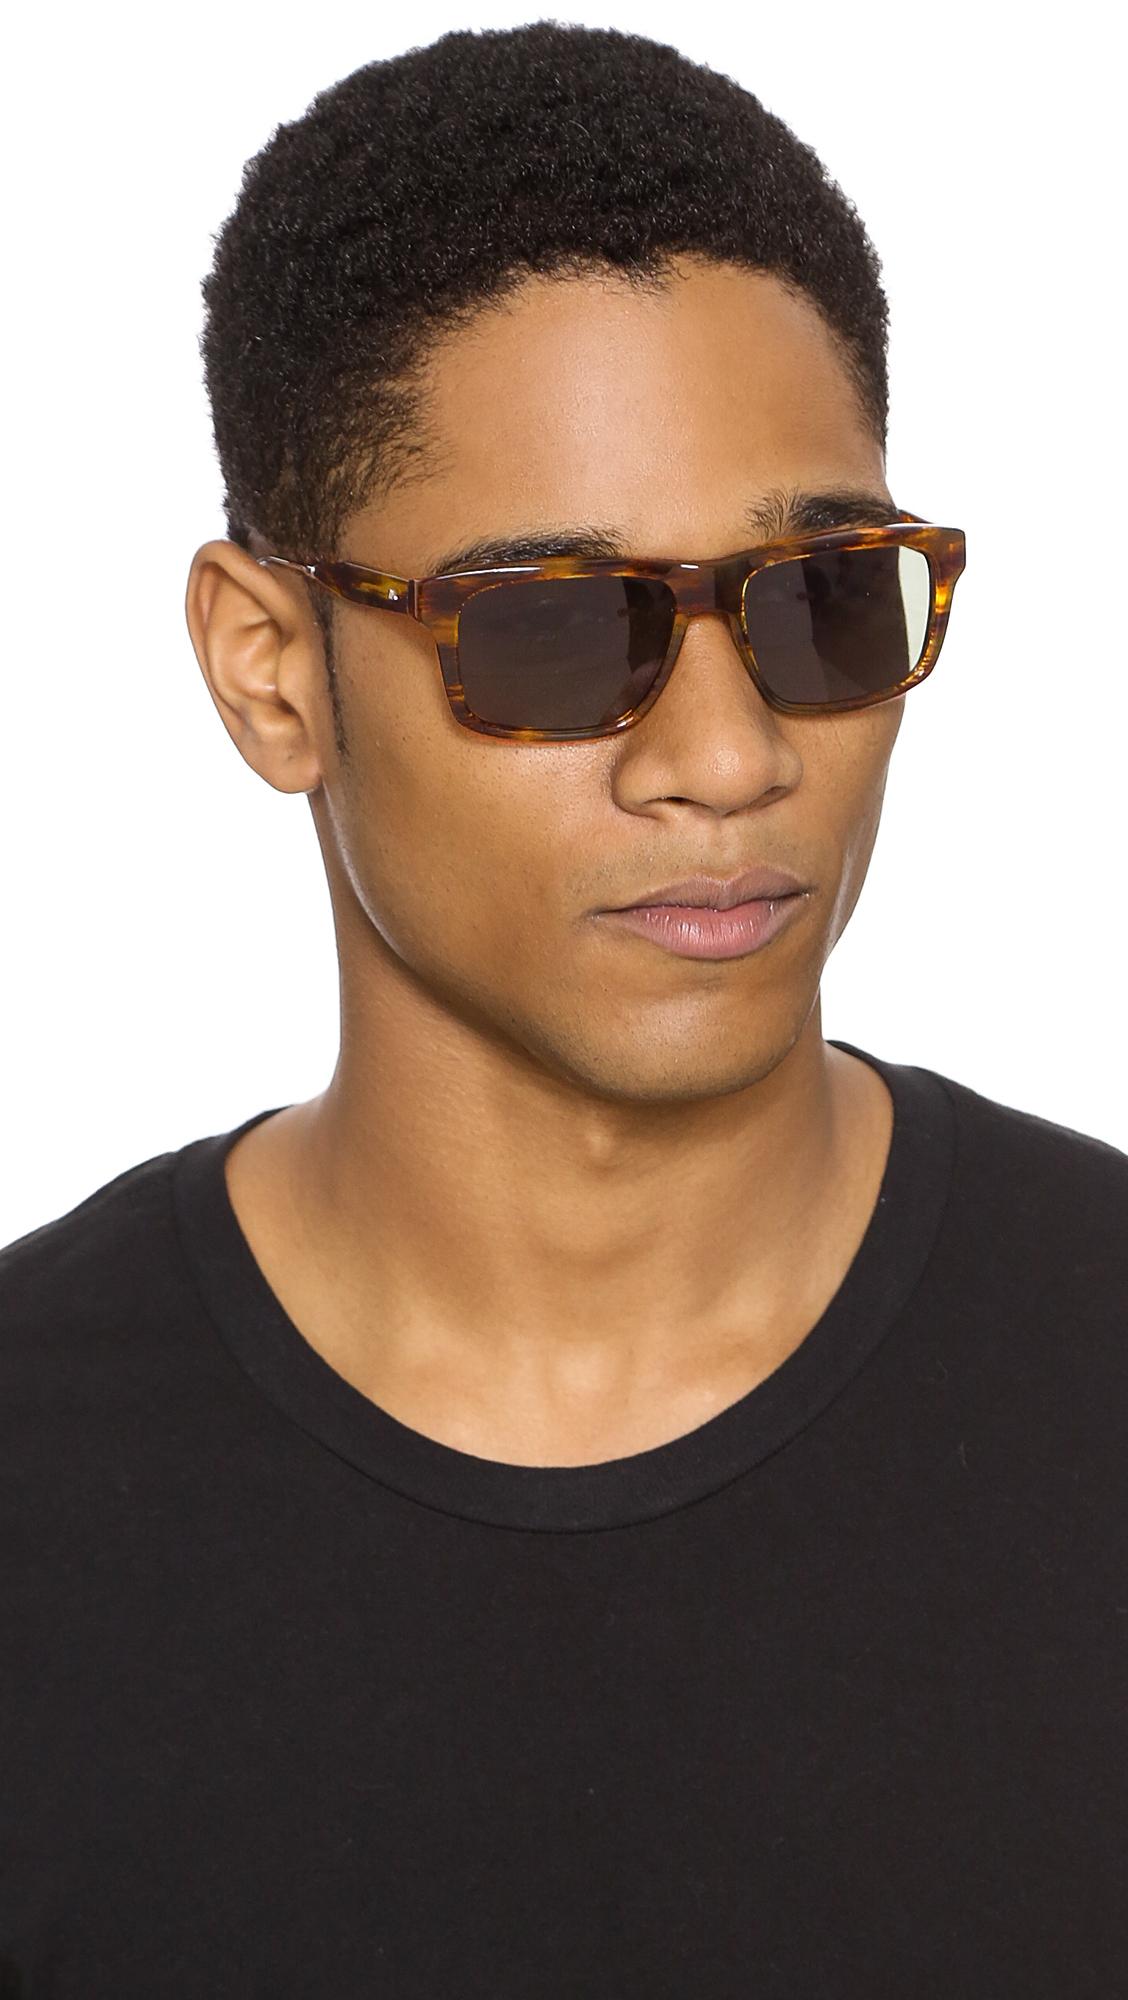 fc869f6106 Oliver peoples Gaviota Polarized Sunglasses in Brown for Men (Light  Tortoise Sage)